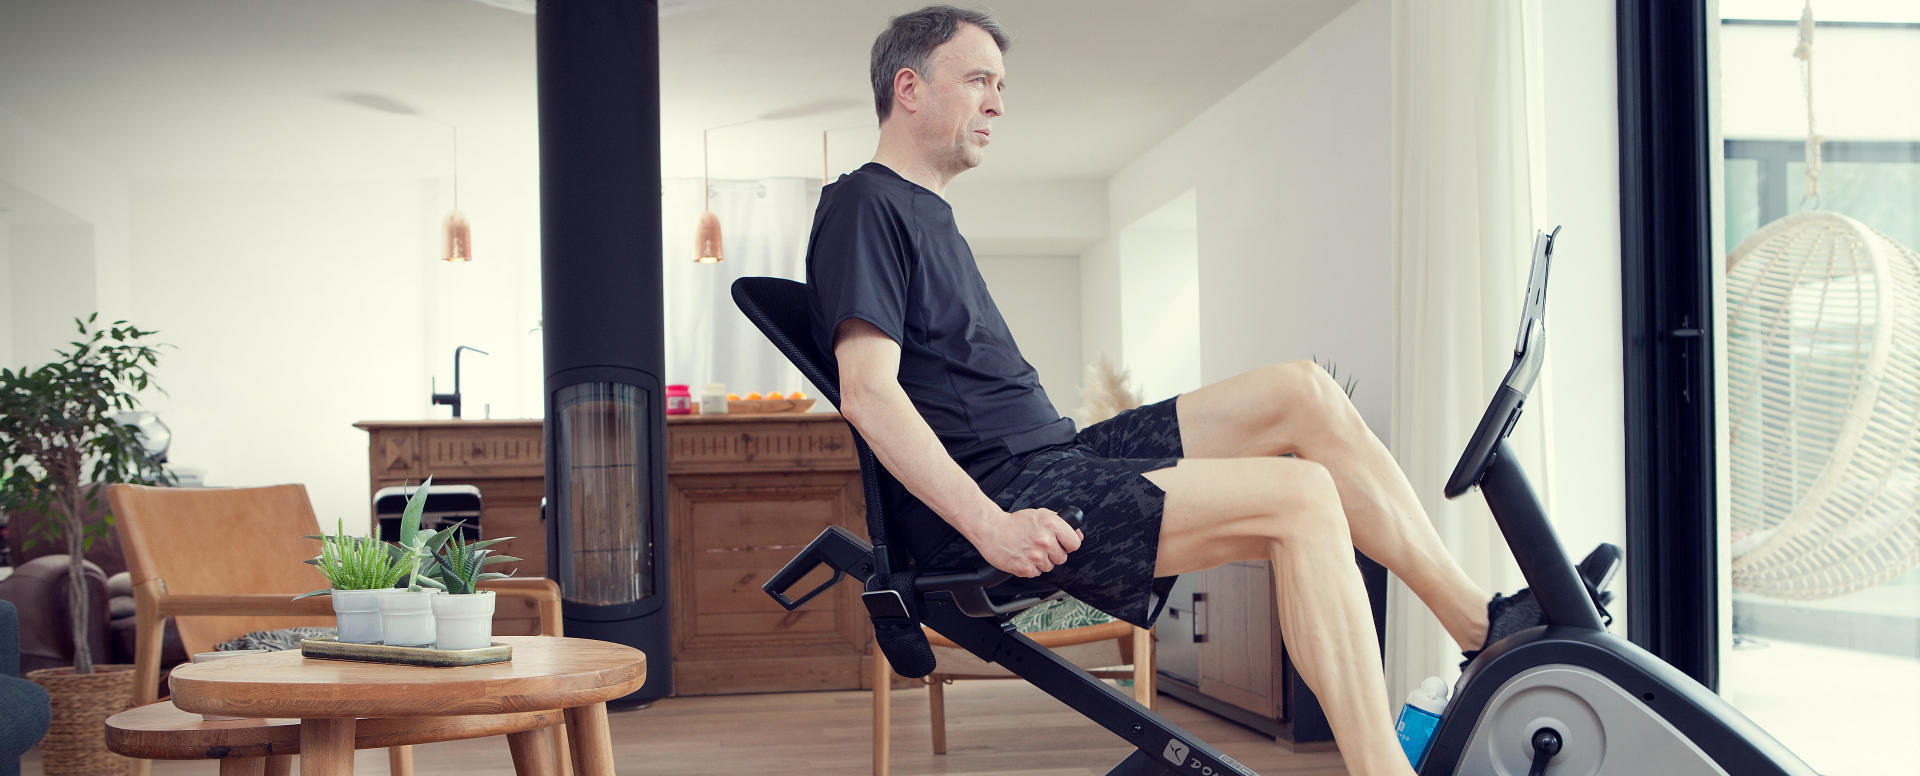 Leg Workouts | 33 Must Try Leg Workouts | Blog Decathlon